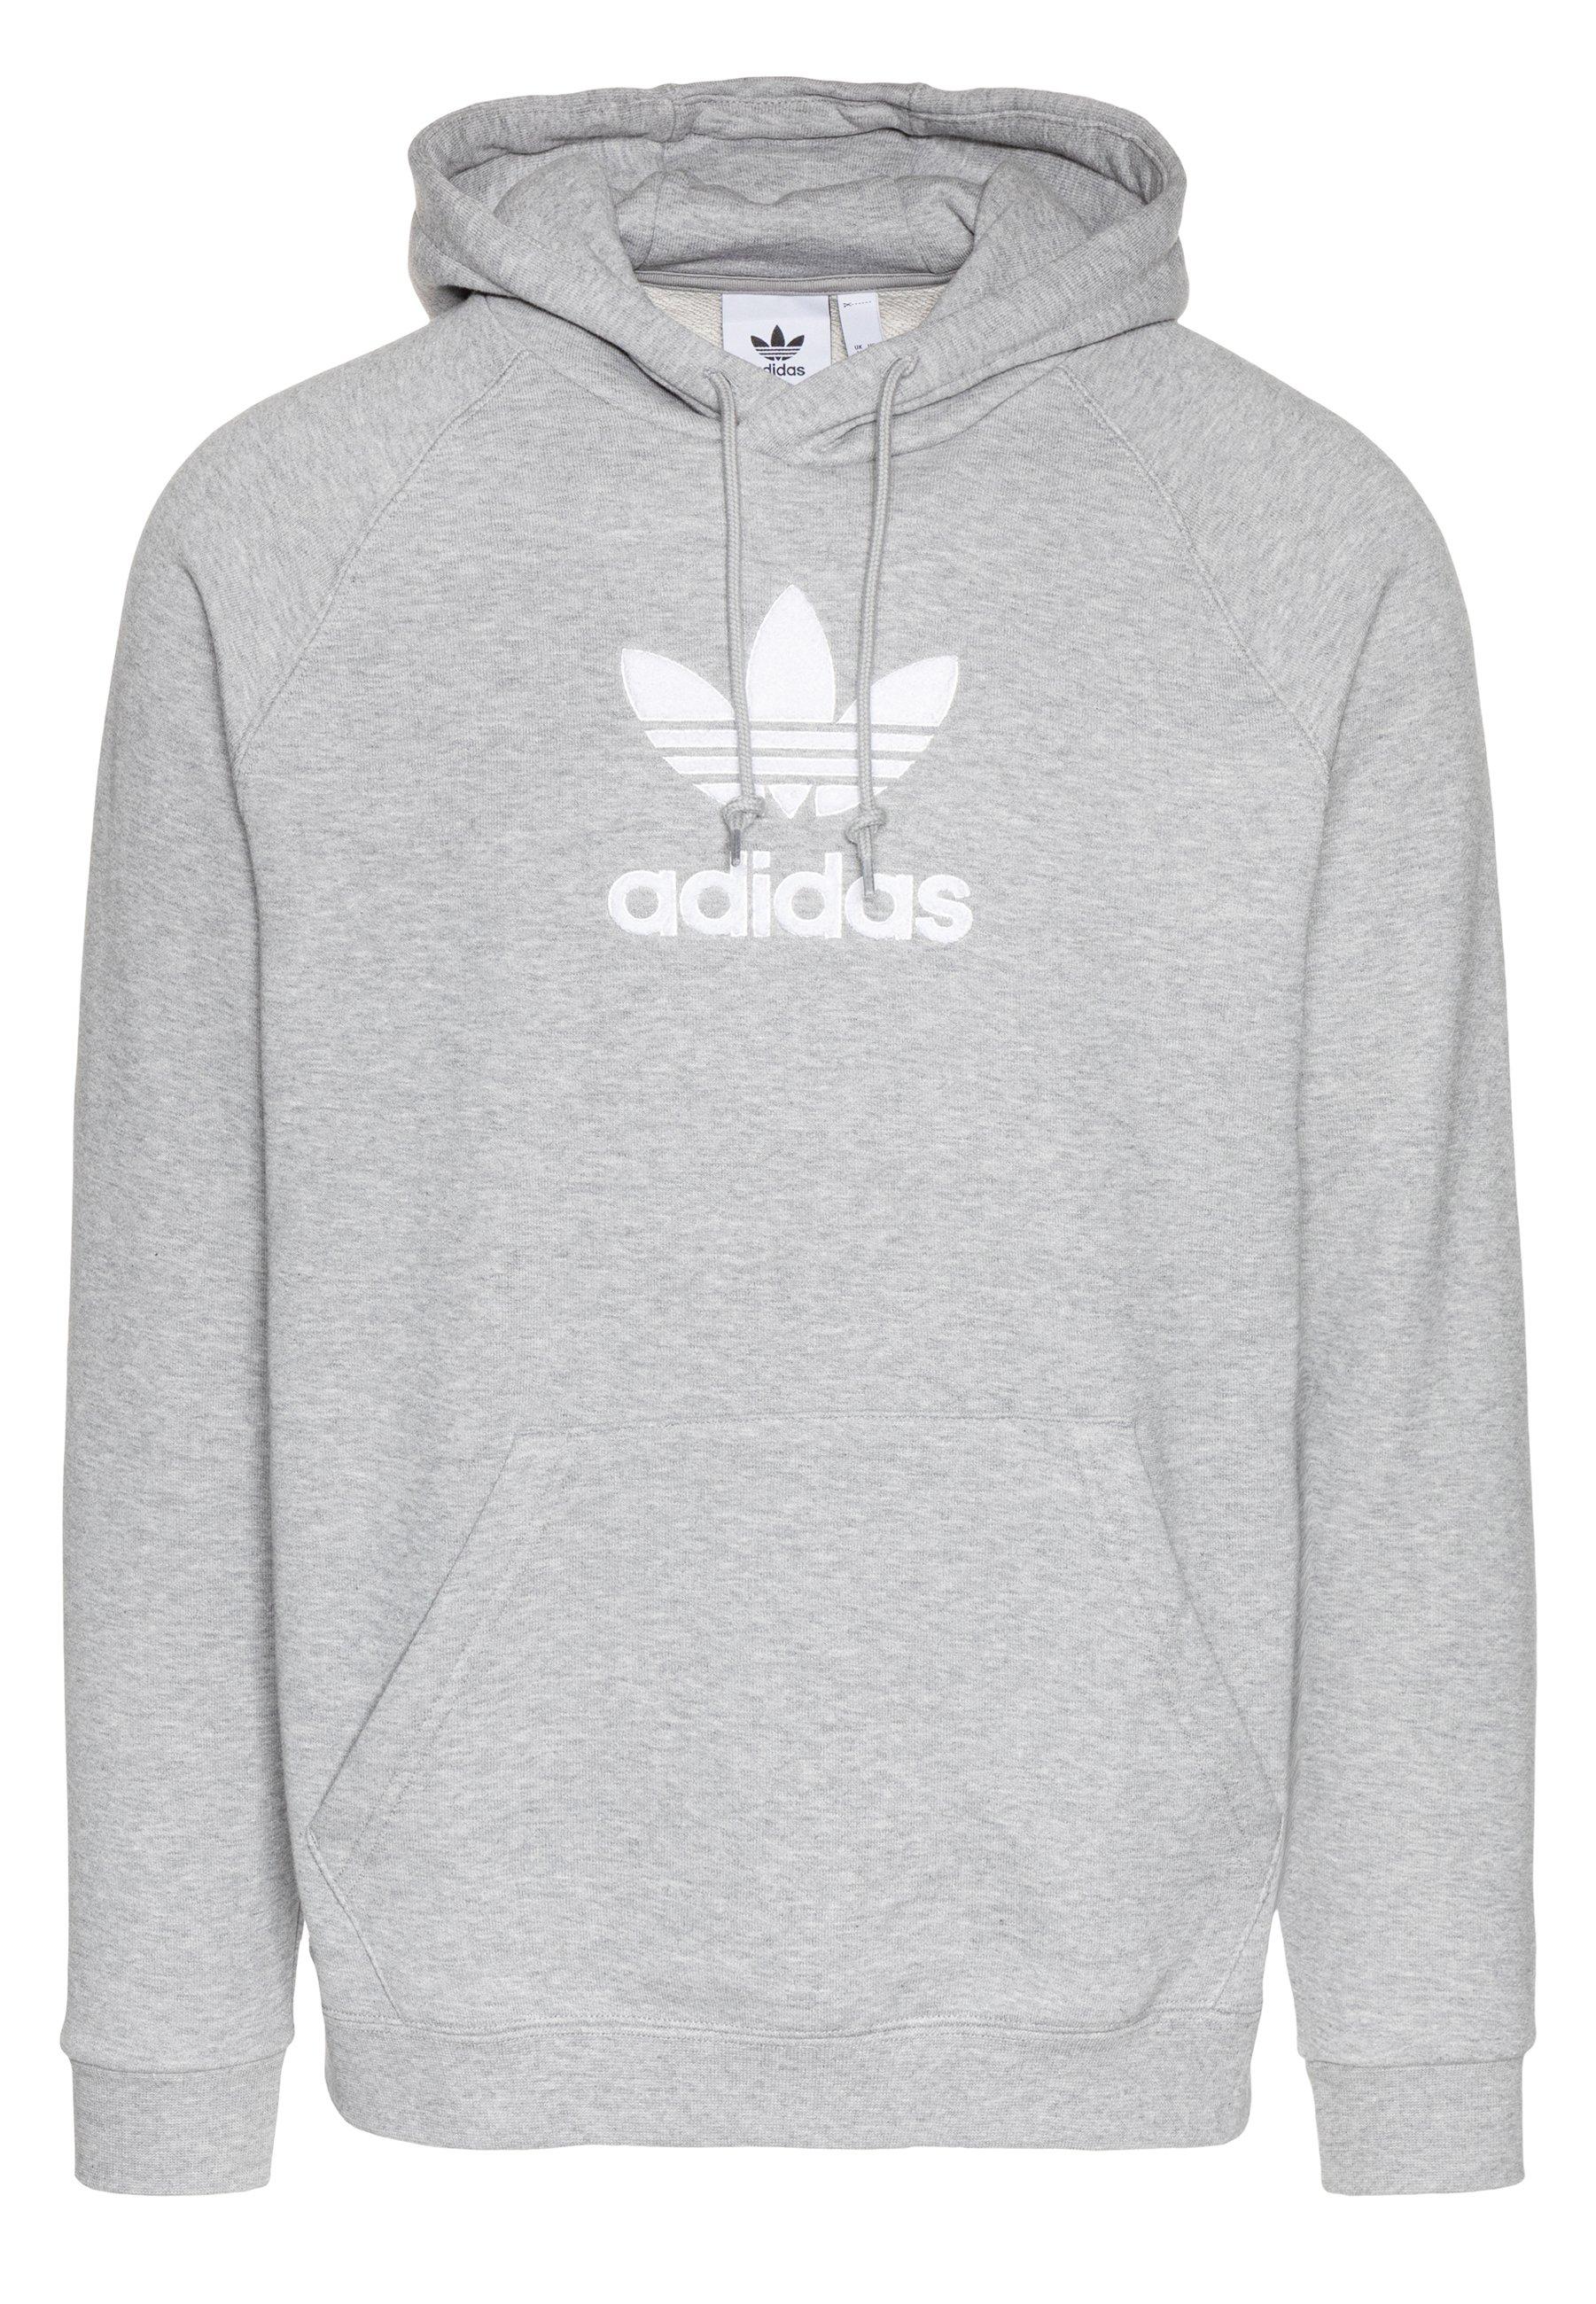 Adidas Originals Adicolor Premium Trefoil Hoddie Sweat - Bluza Z Kapturem Mgreyh